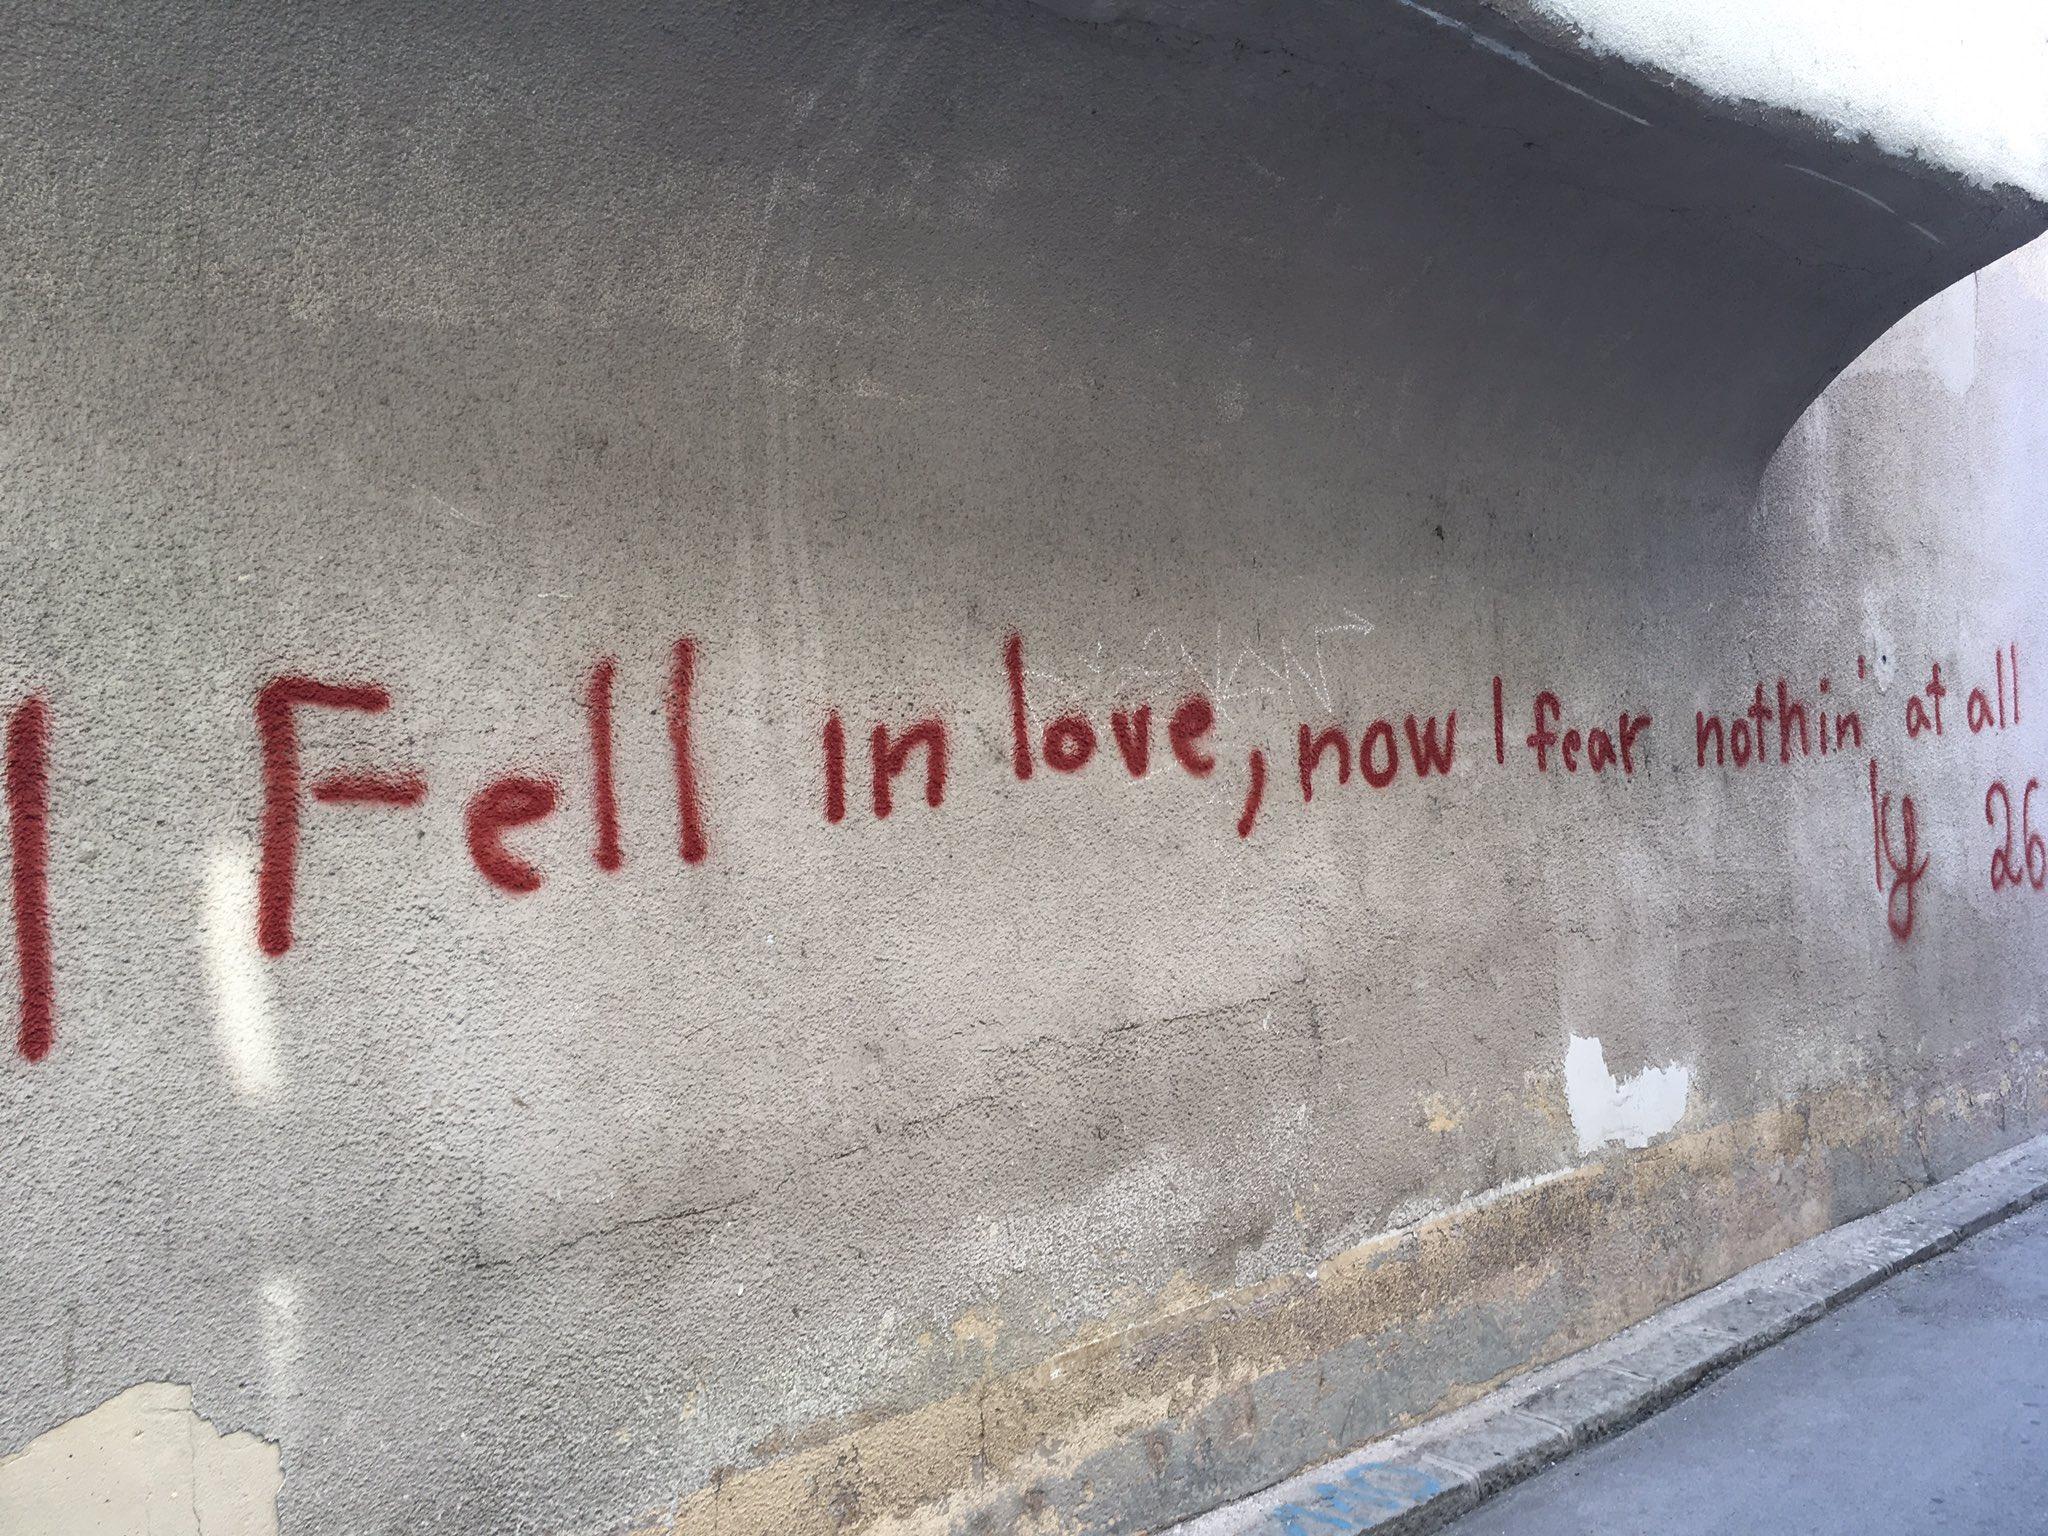 #Sarajevo https://t.co/6EGZ2DkdSV